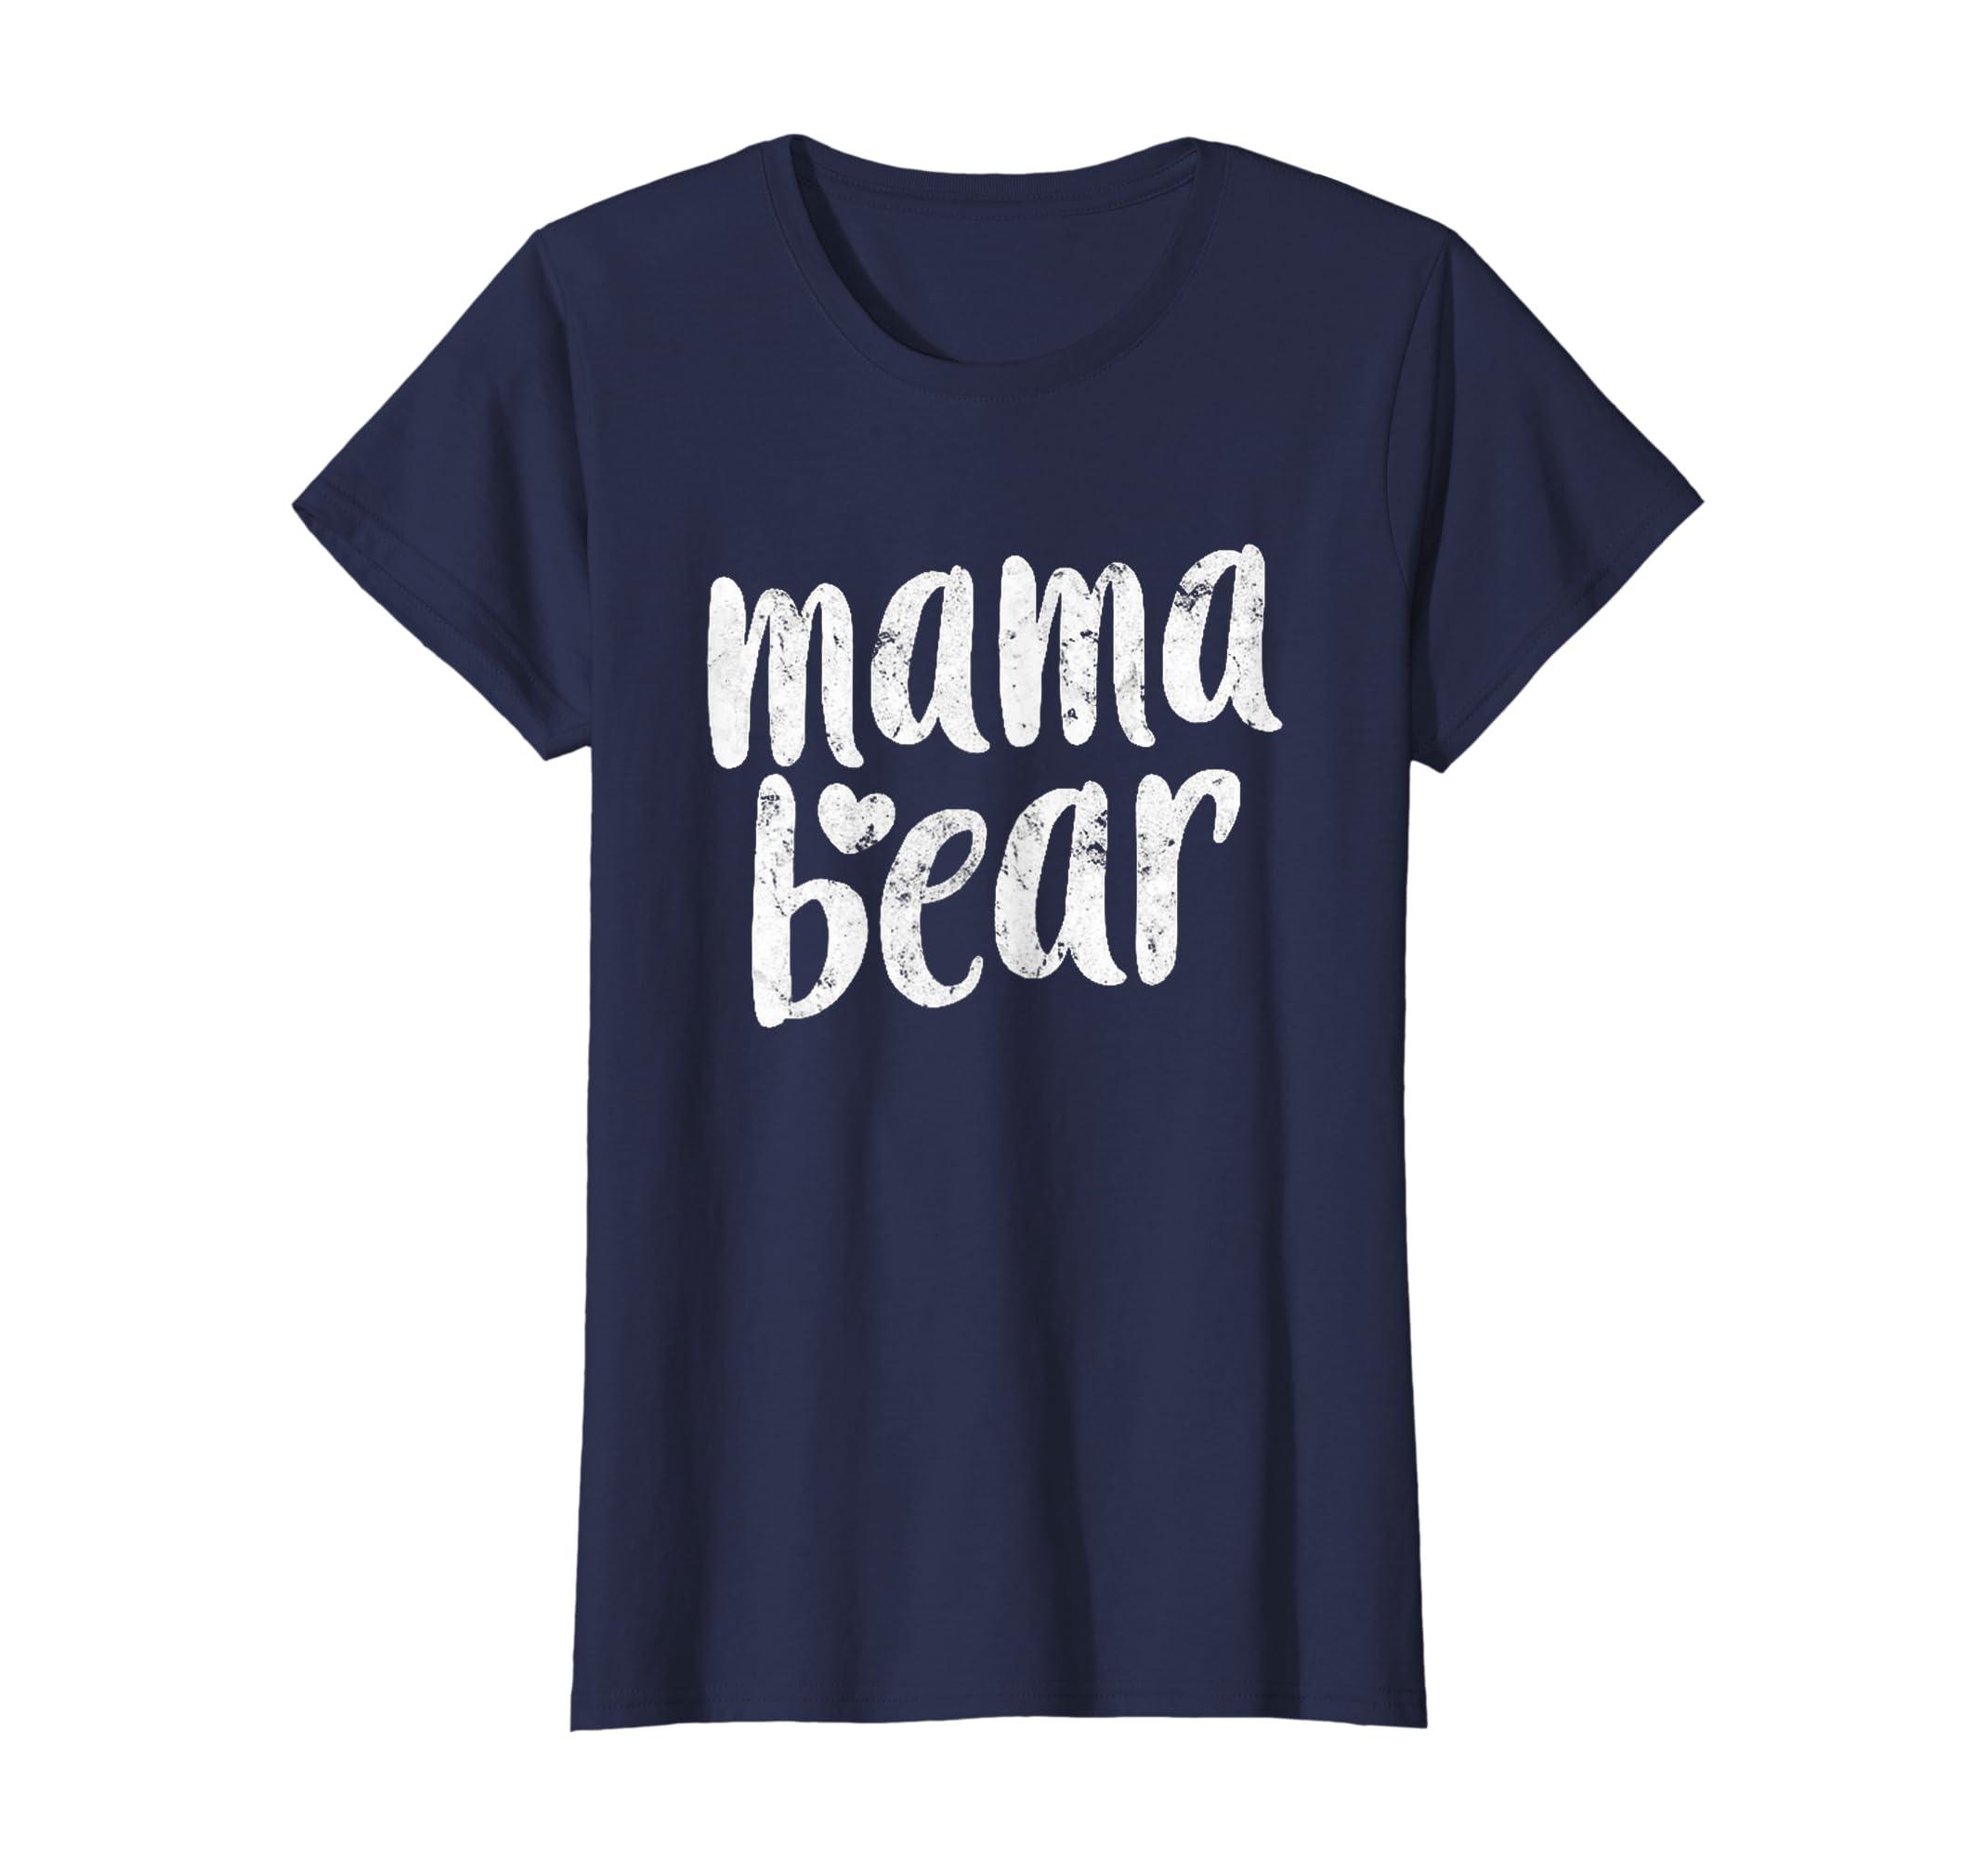 b2aef812 Amazon.com: Mama bear T-Shirt: Clothing